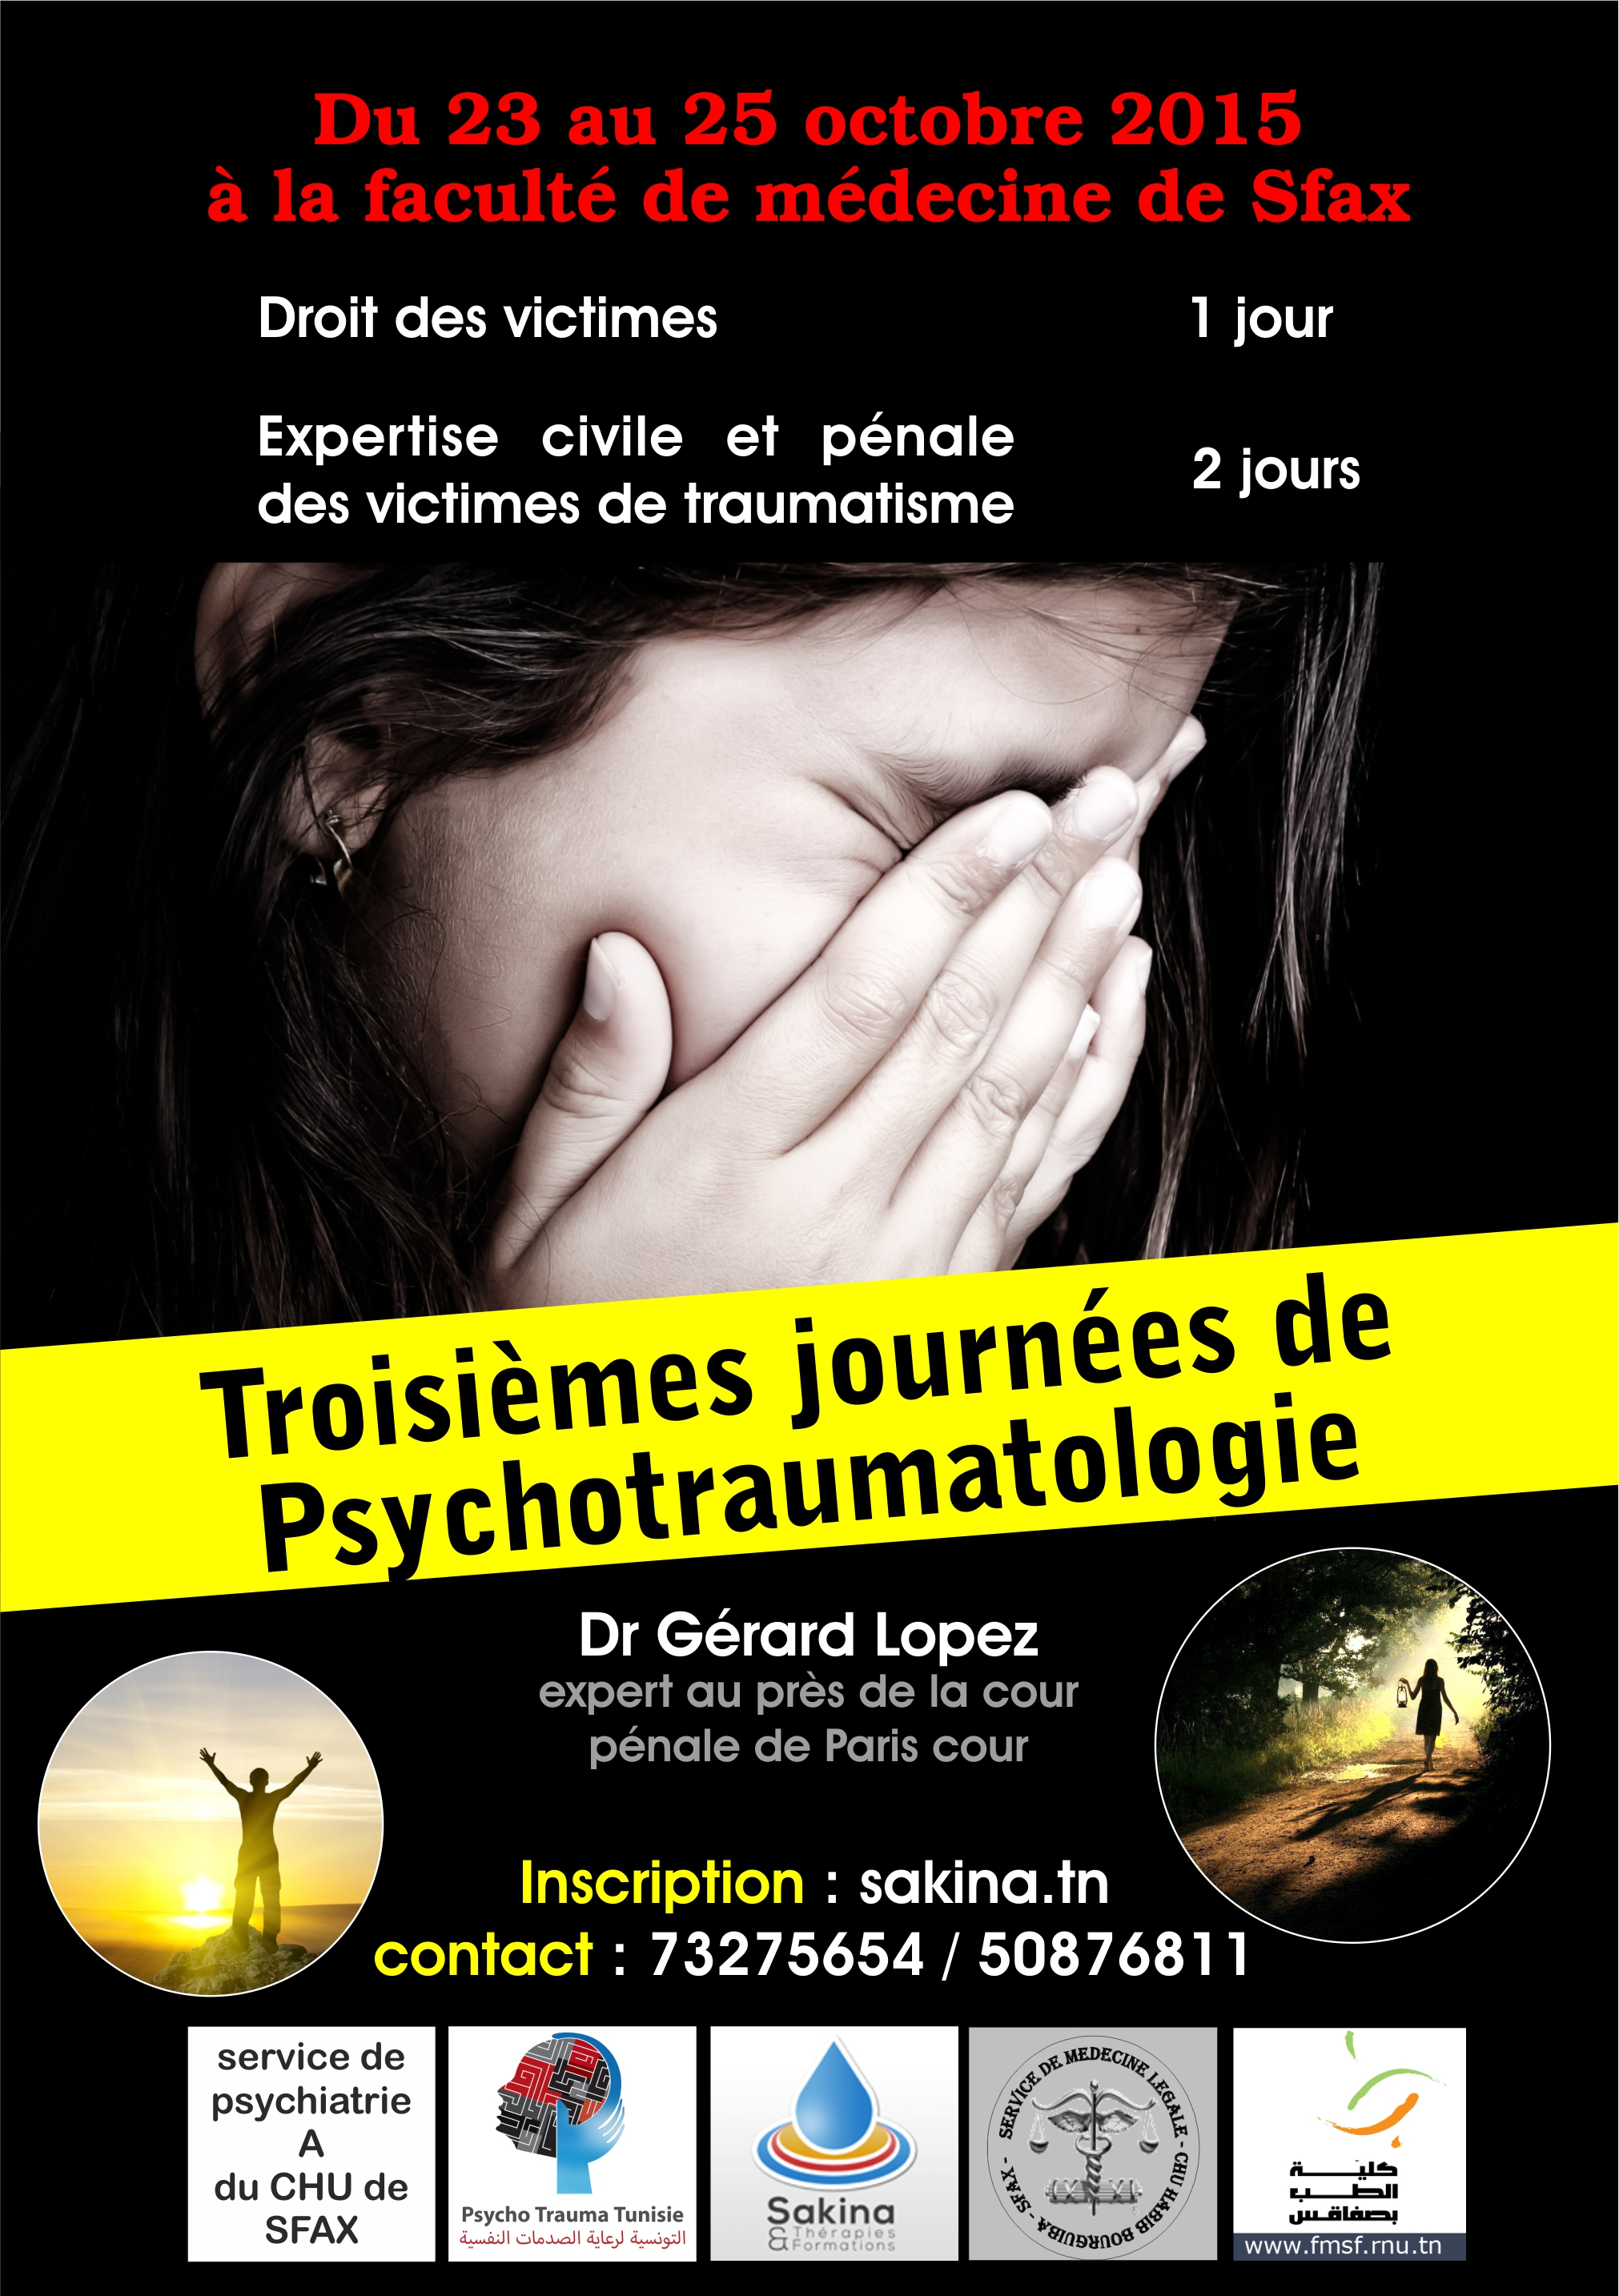 diplome universitaire psychotraumatologie paris 5